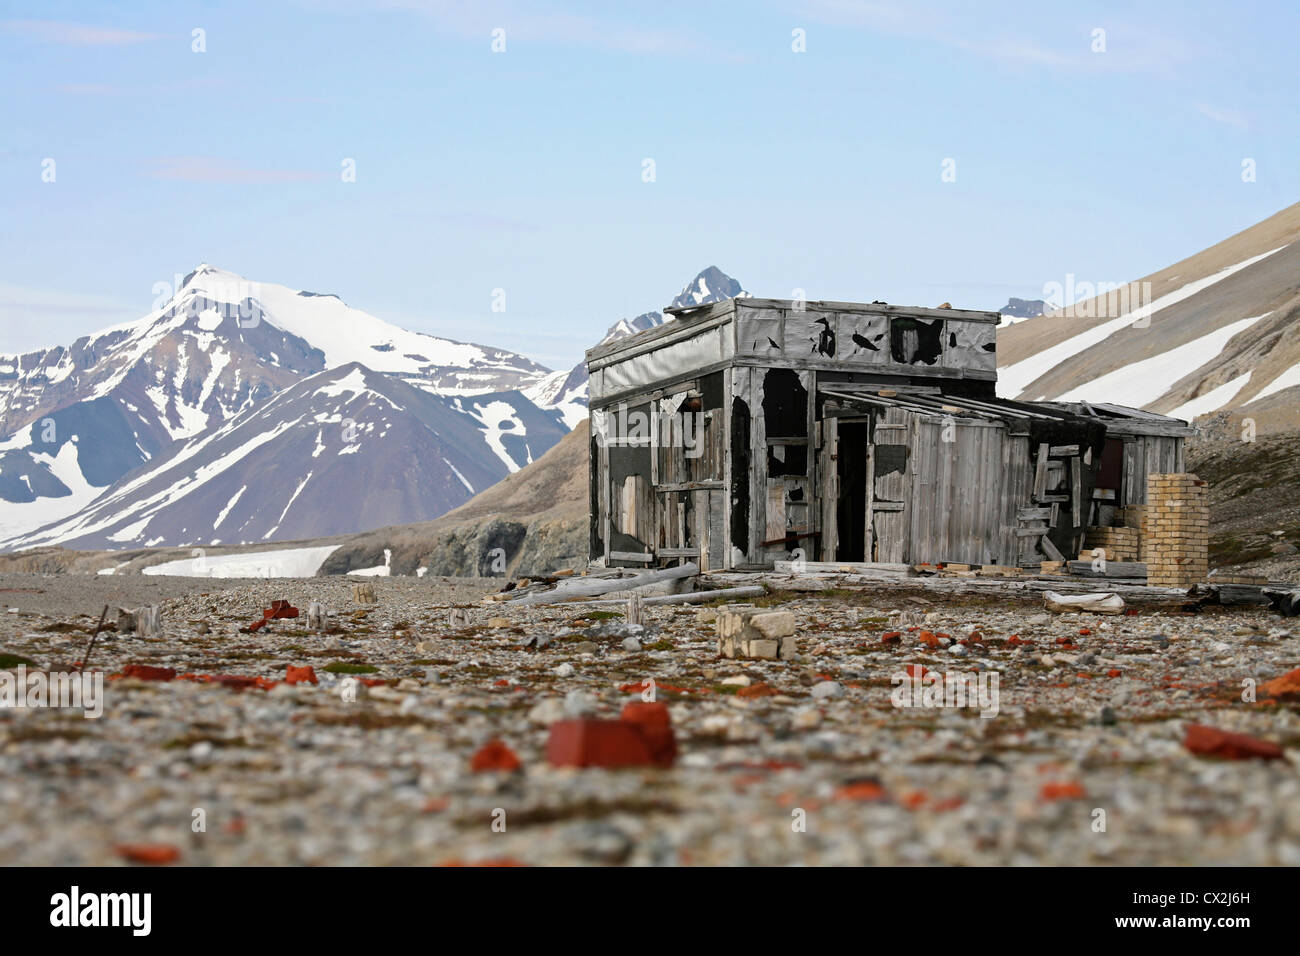 Old wooden hunting cabin in the Hornsund, Svalbard, Spitsbergen, Norway - Stock Image